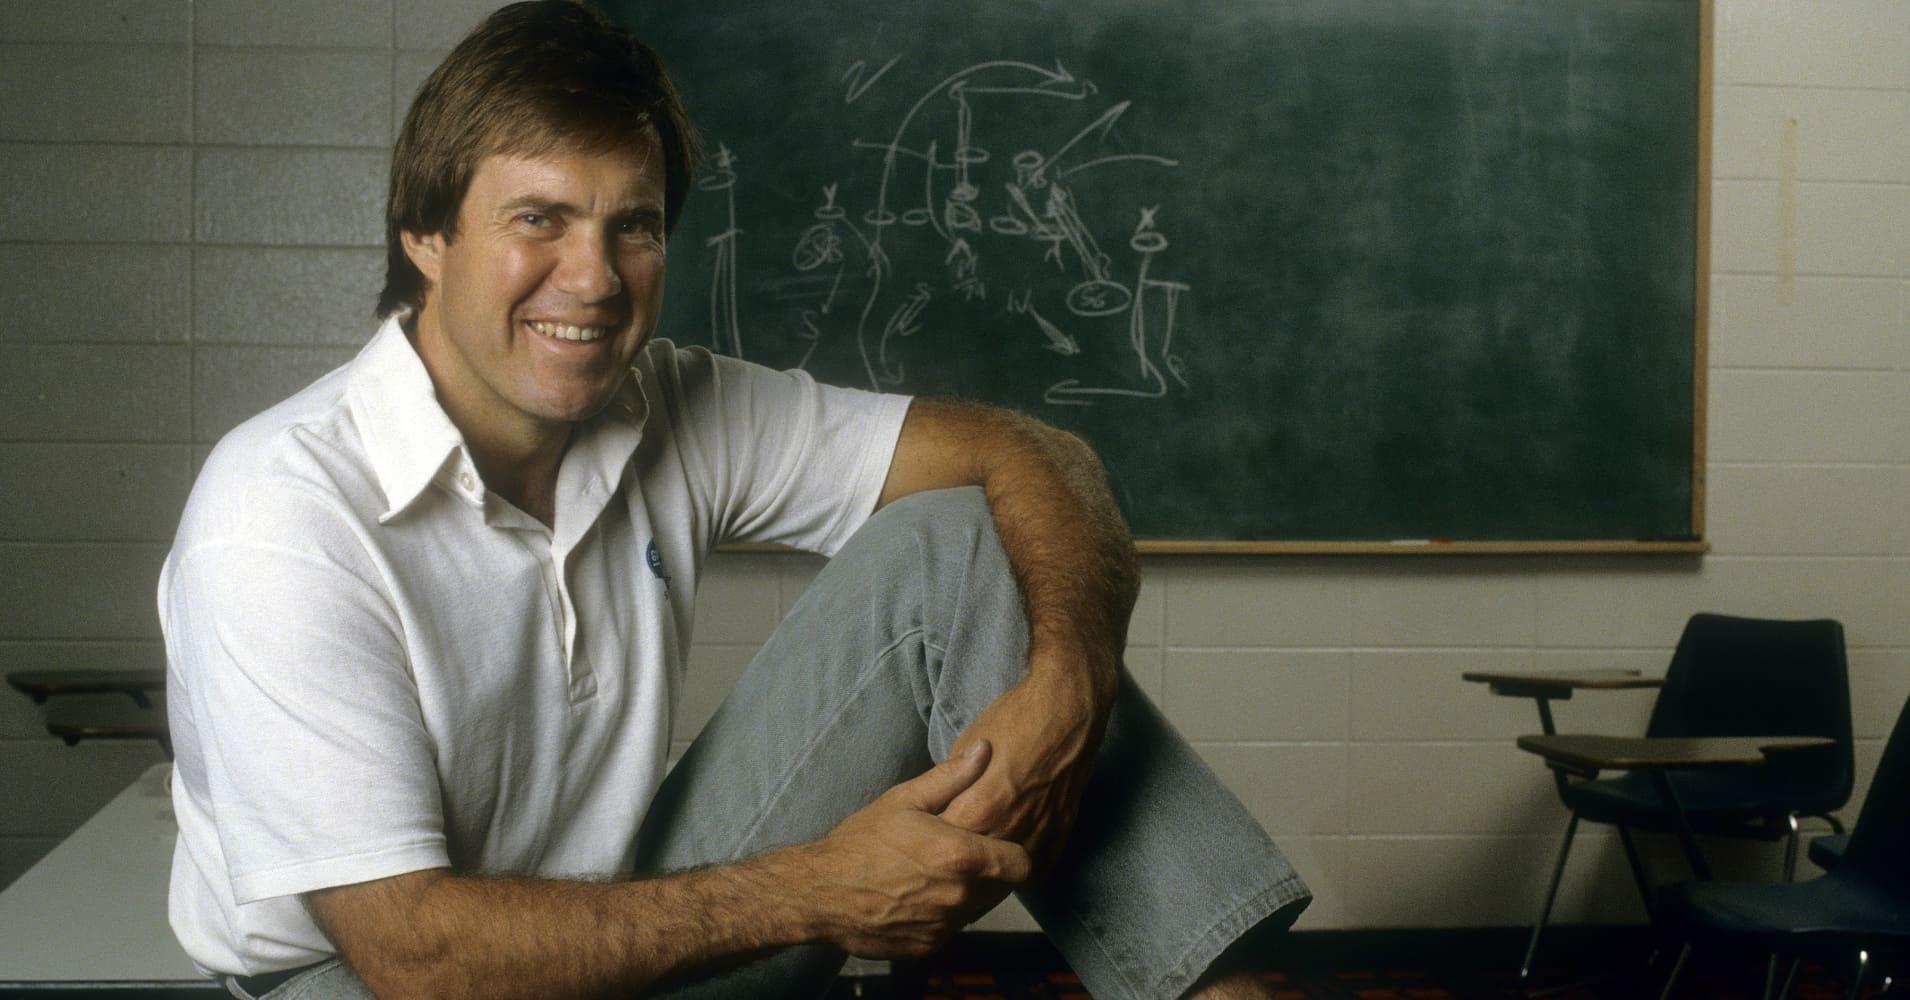 Bill Belichick circa 1985